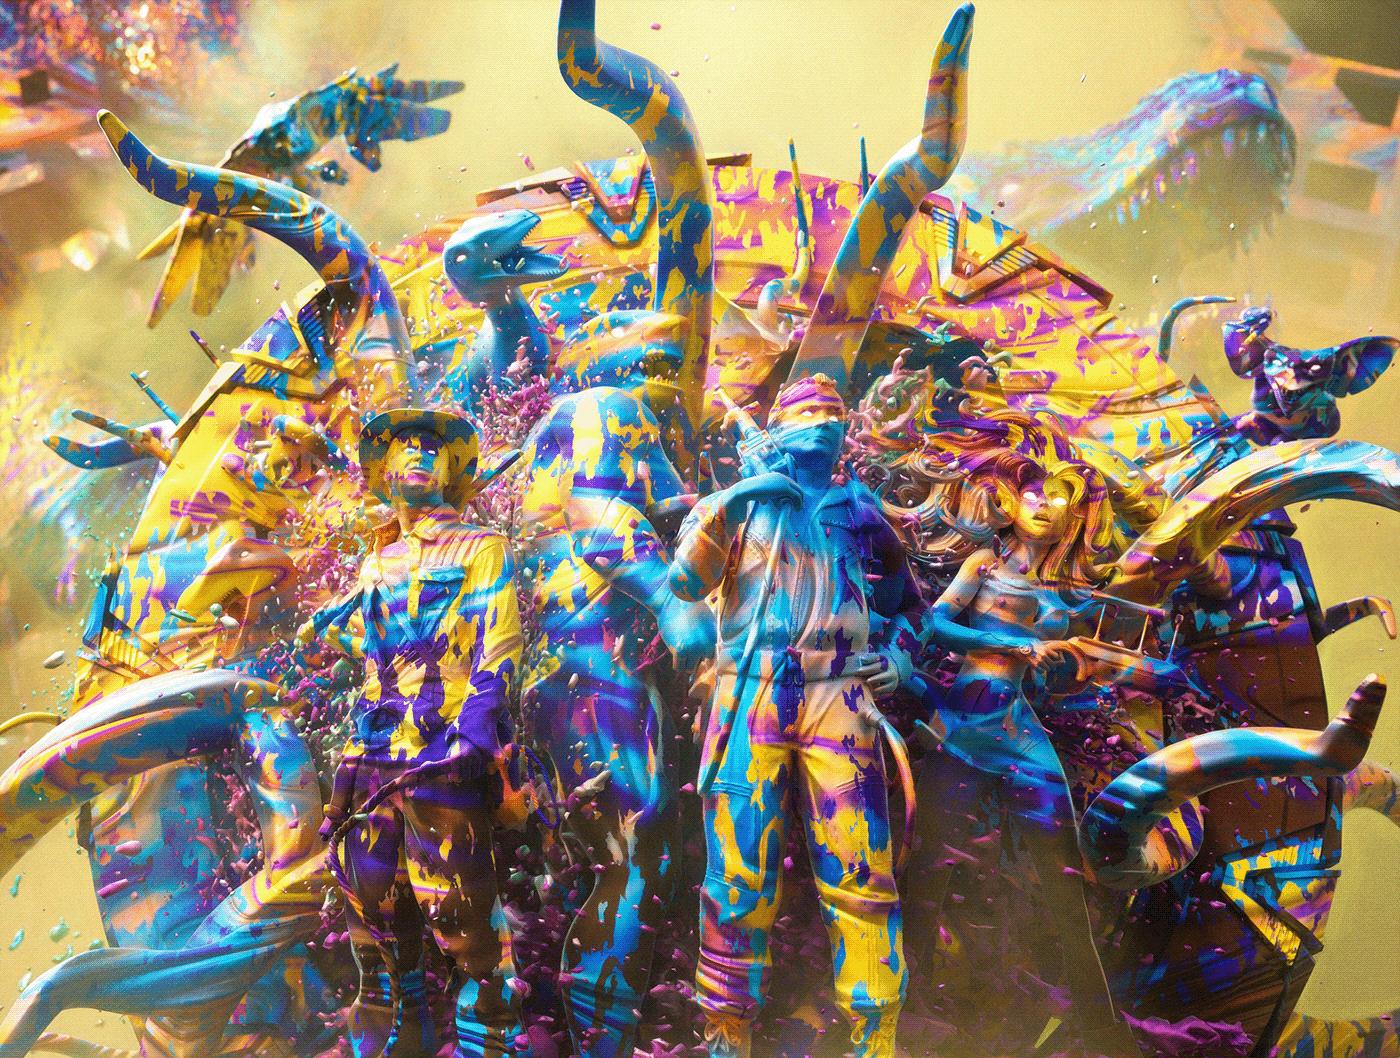 chaos color fantasy Love Movies sci-fi tv